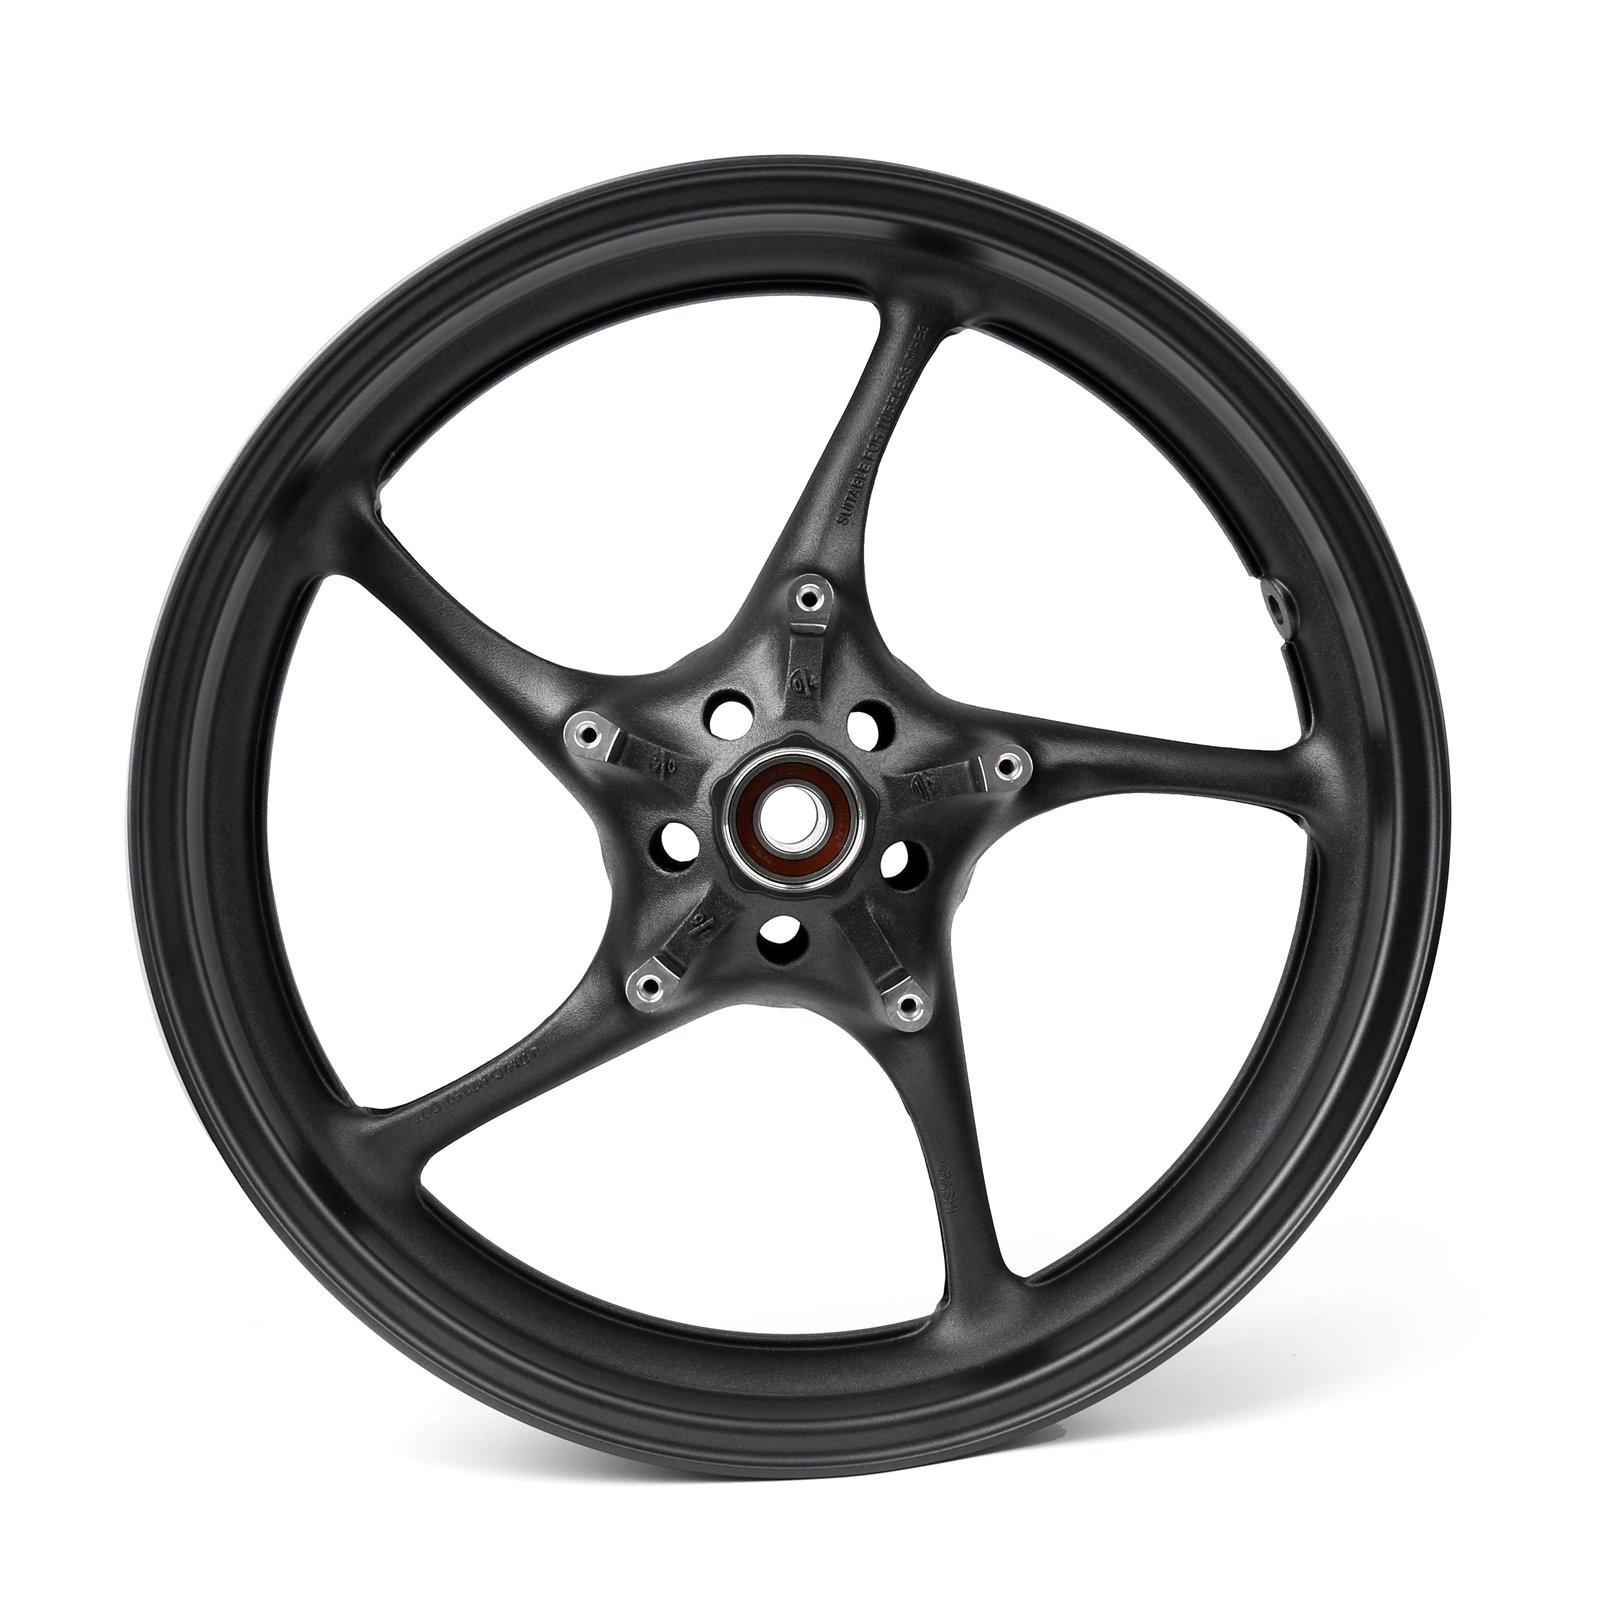 Artudatech Brand NEW Front Wheel Rim Yamaha YZF R6/R6R/R6S 2003-2009 YZF R1 2004-2012